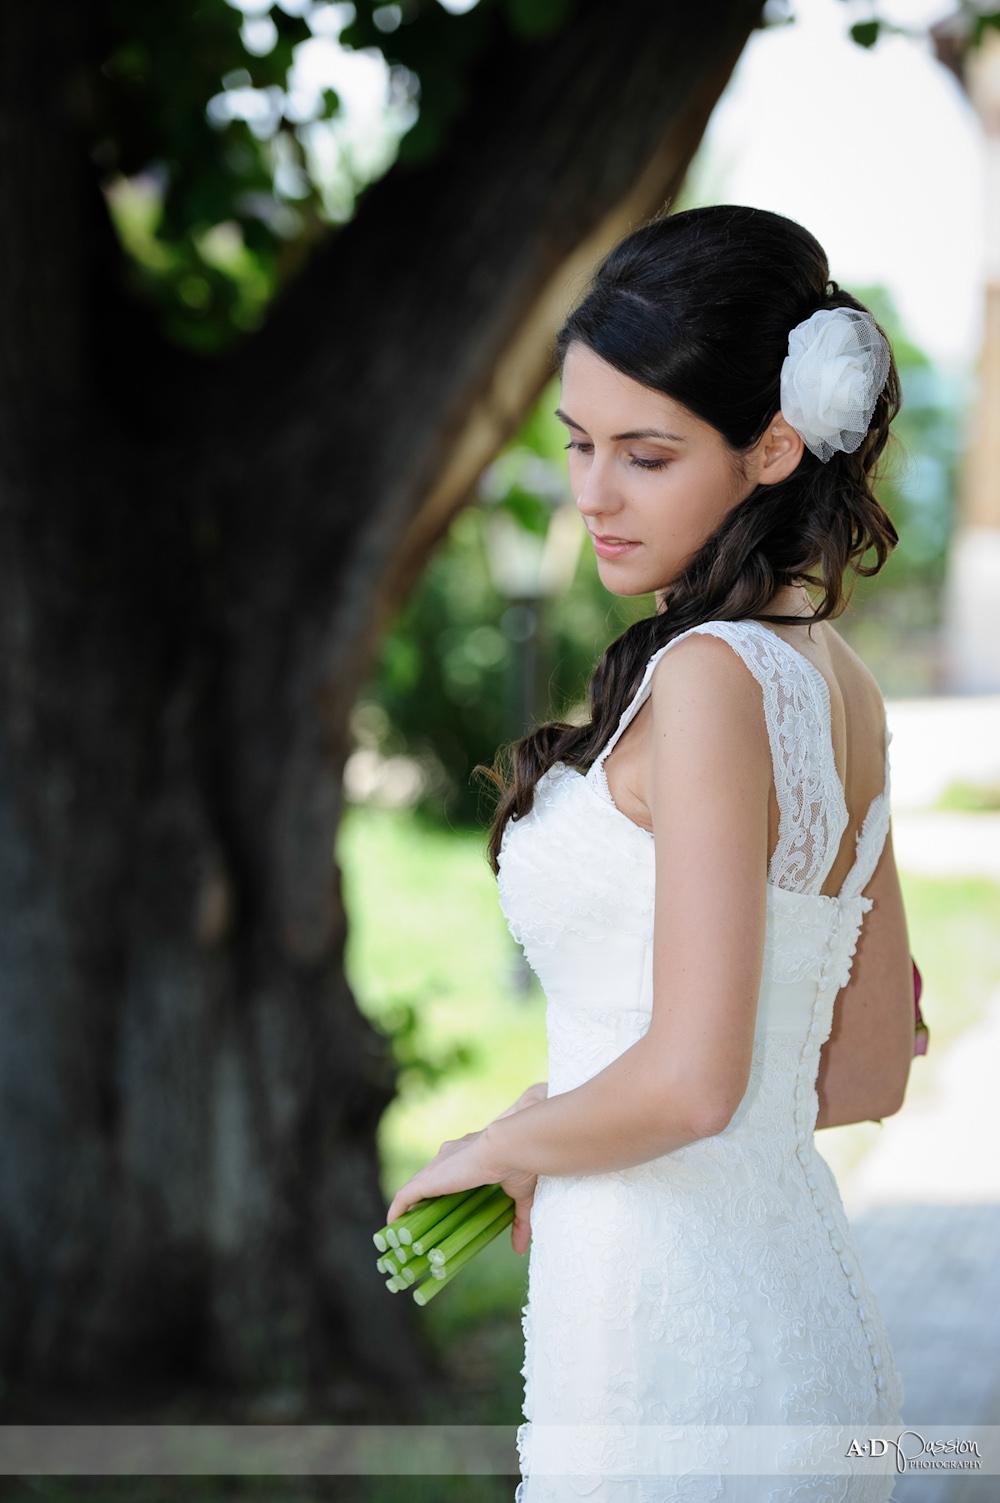 AD Passion Photography | fotograf-profesionist-nunta-piatra-neamt-lavinia-si-mihai_0058 | Adelin, Dida, fotograf profesionist, fotograf de nunta, fotografie de nunta, fotograf Timisoara, fotograf Craiova, fotograf Bucuresti, fotograf Arad, nunta Timisoara, nunta Arad, nunta Bucuresti, nunta Craiova